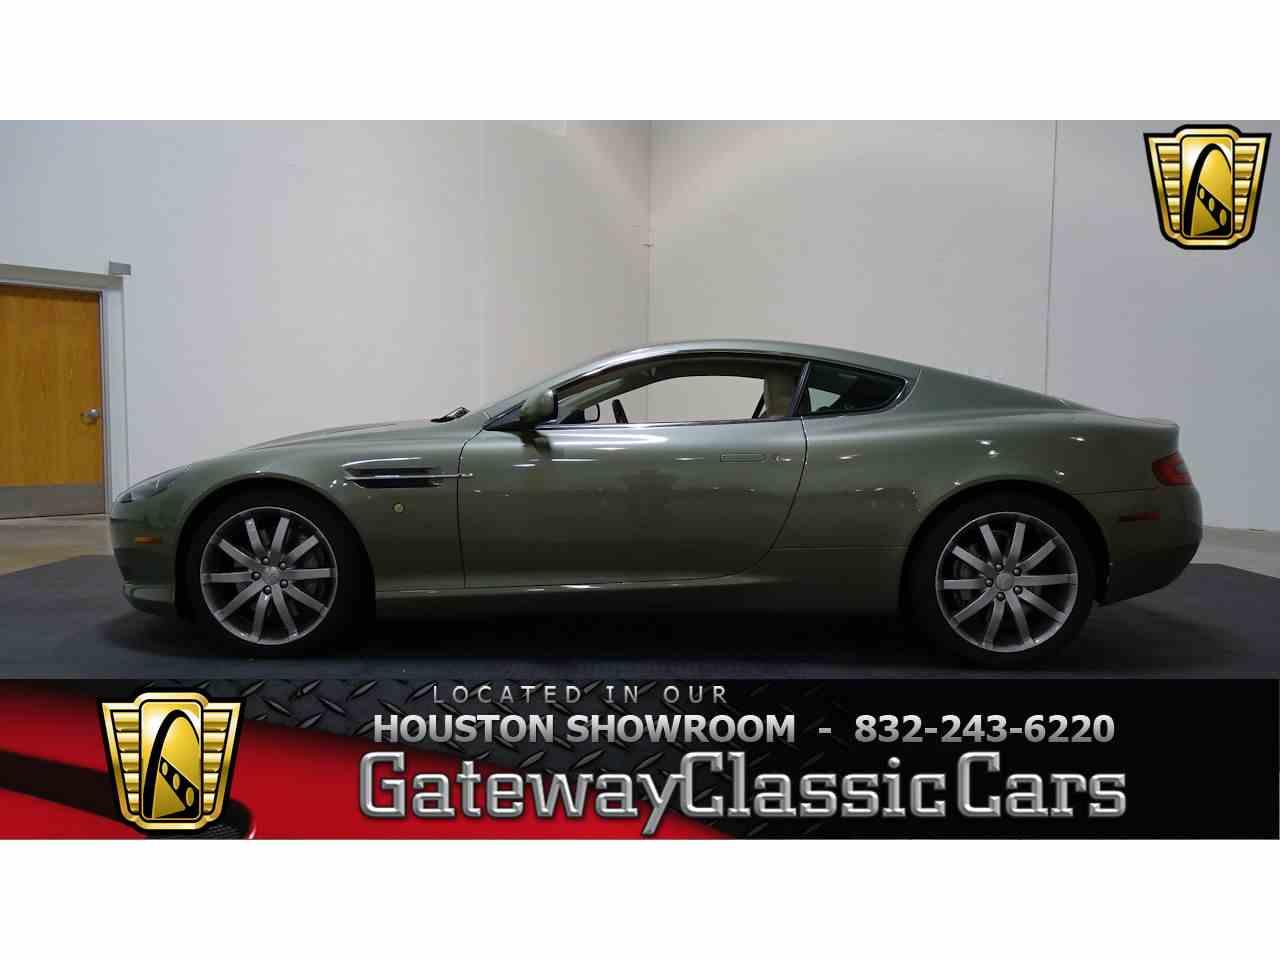 2005 Aston Martin DB9 for Sale - CC-990130